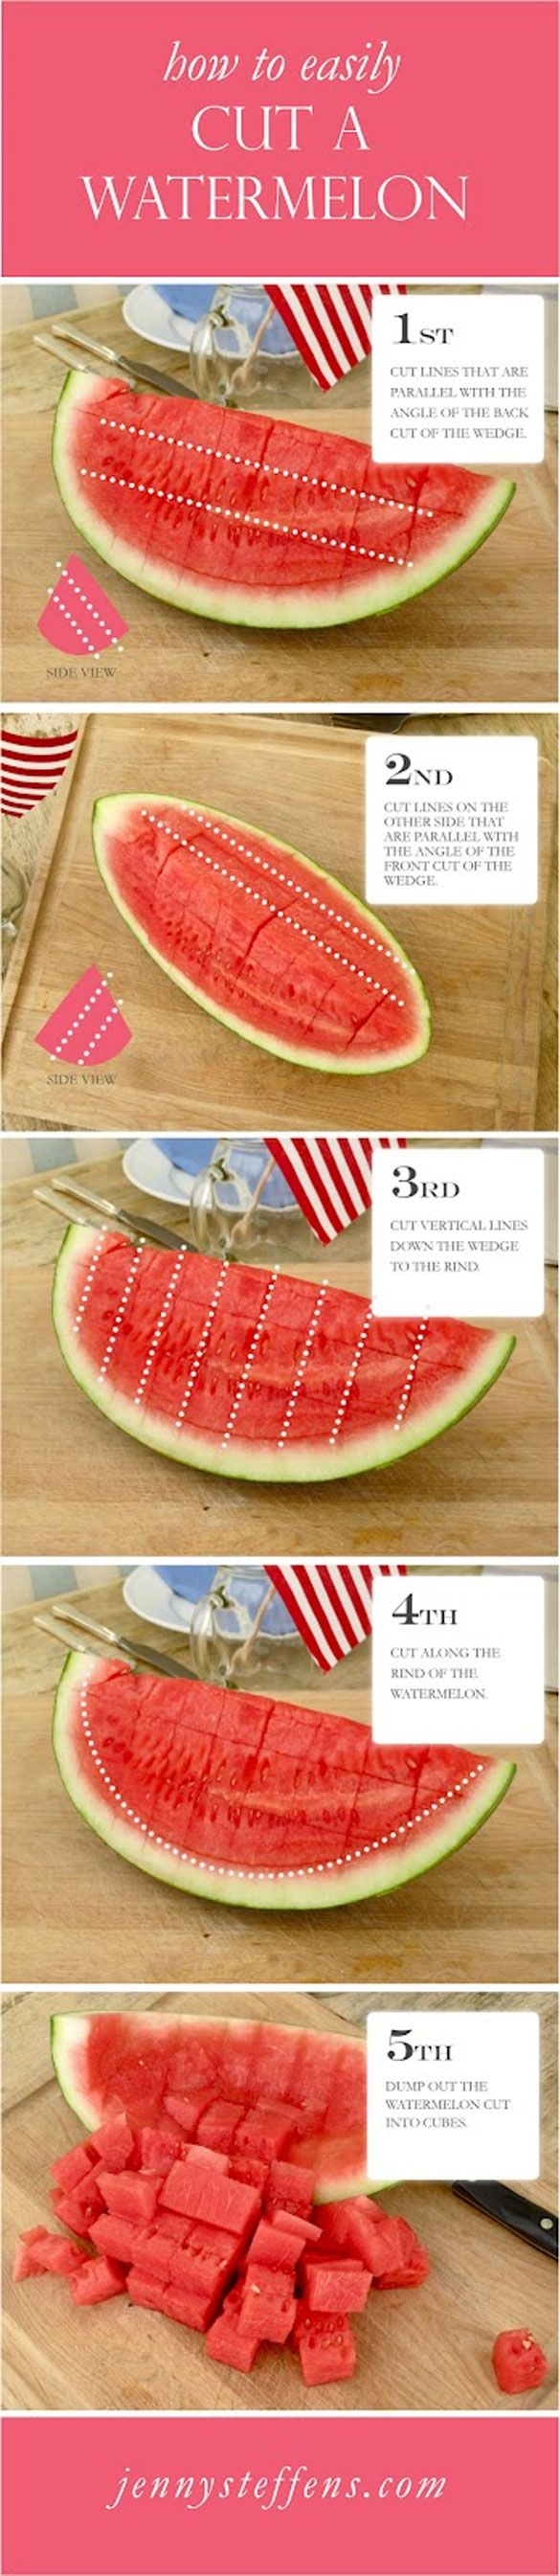 Watermelon | Six Different Ways -Tried it, it works great!